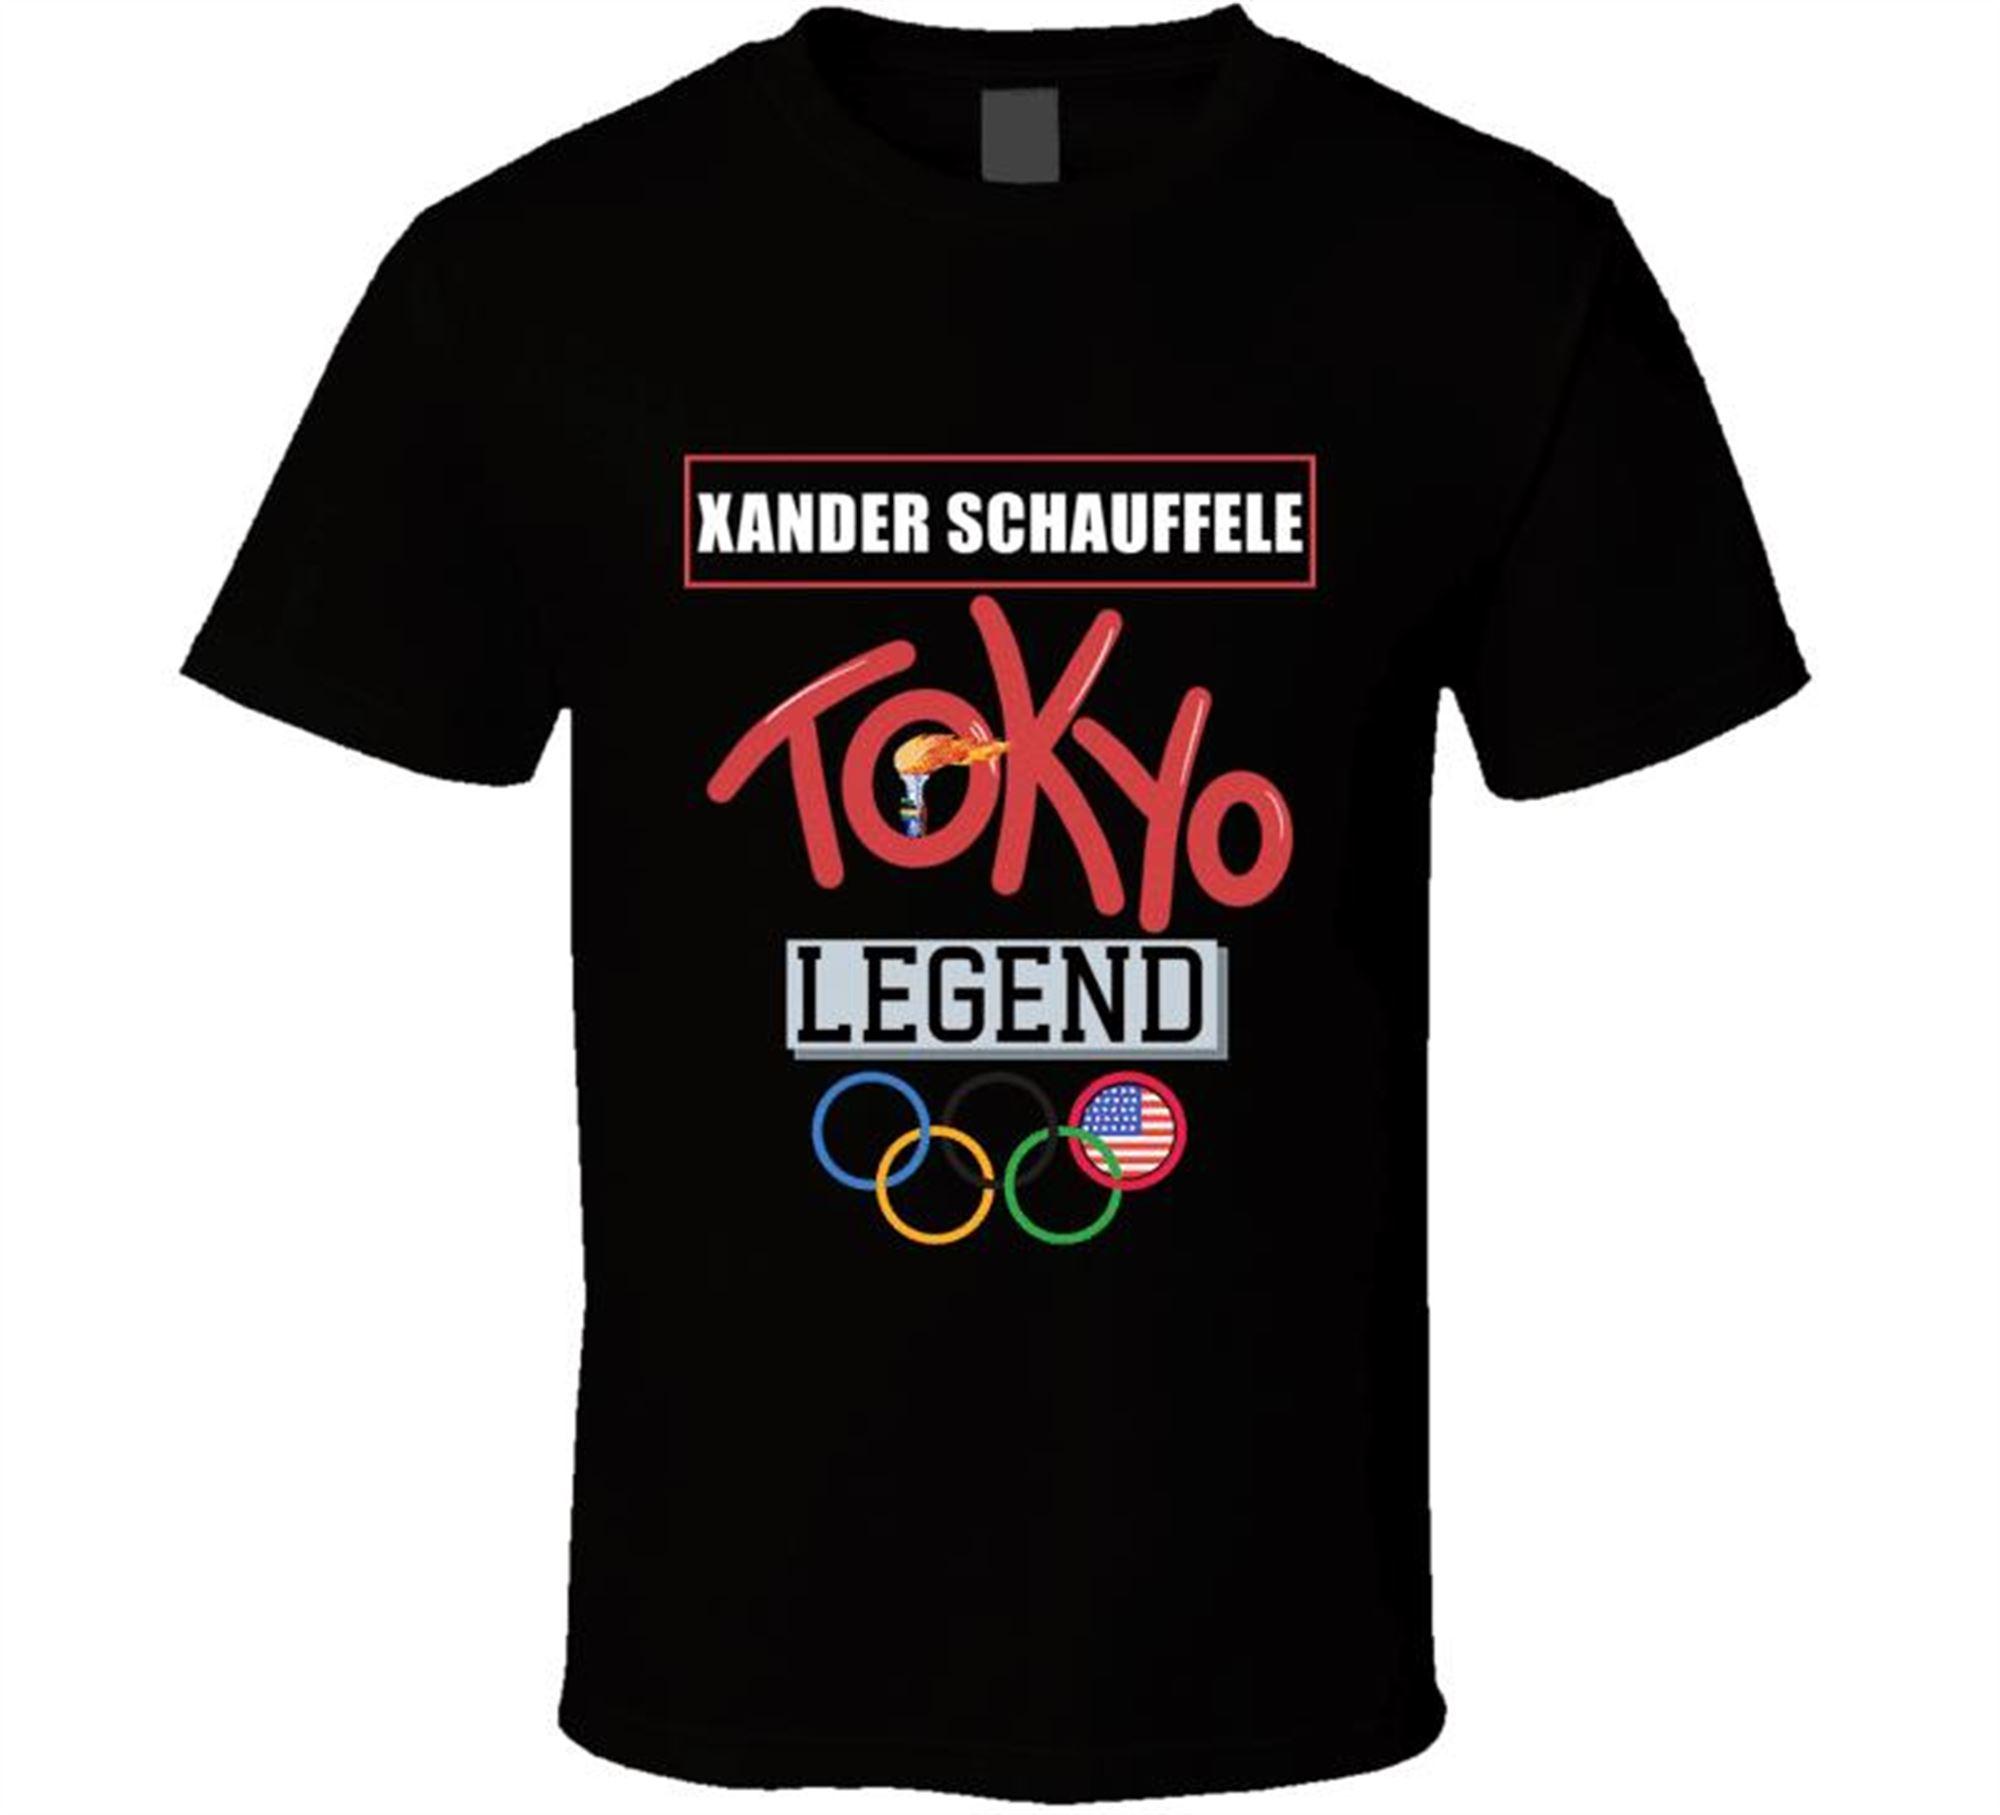 Xander Schauffele Tokyo Legend Team Usa Golf Athlete Olympics T Shirt Plus Size Up To 5x